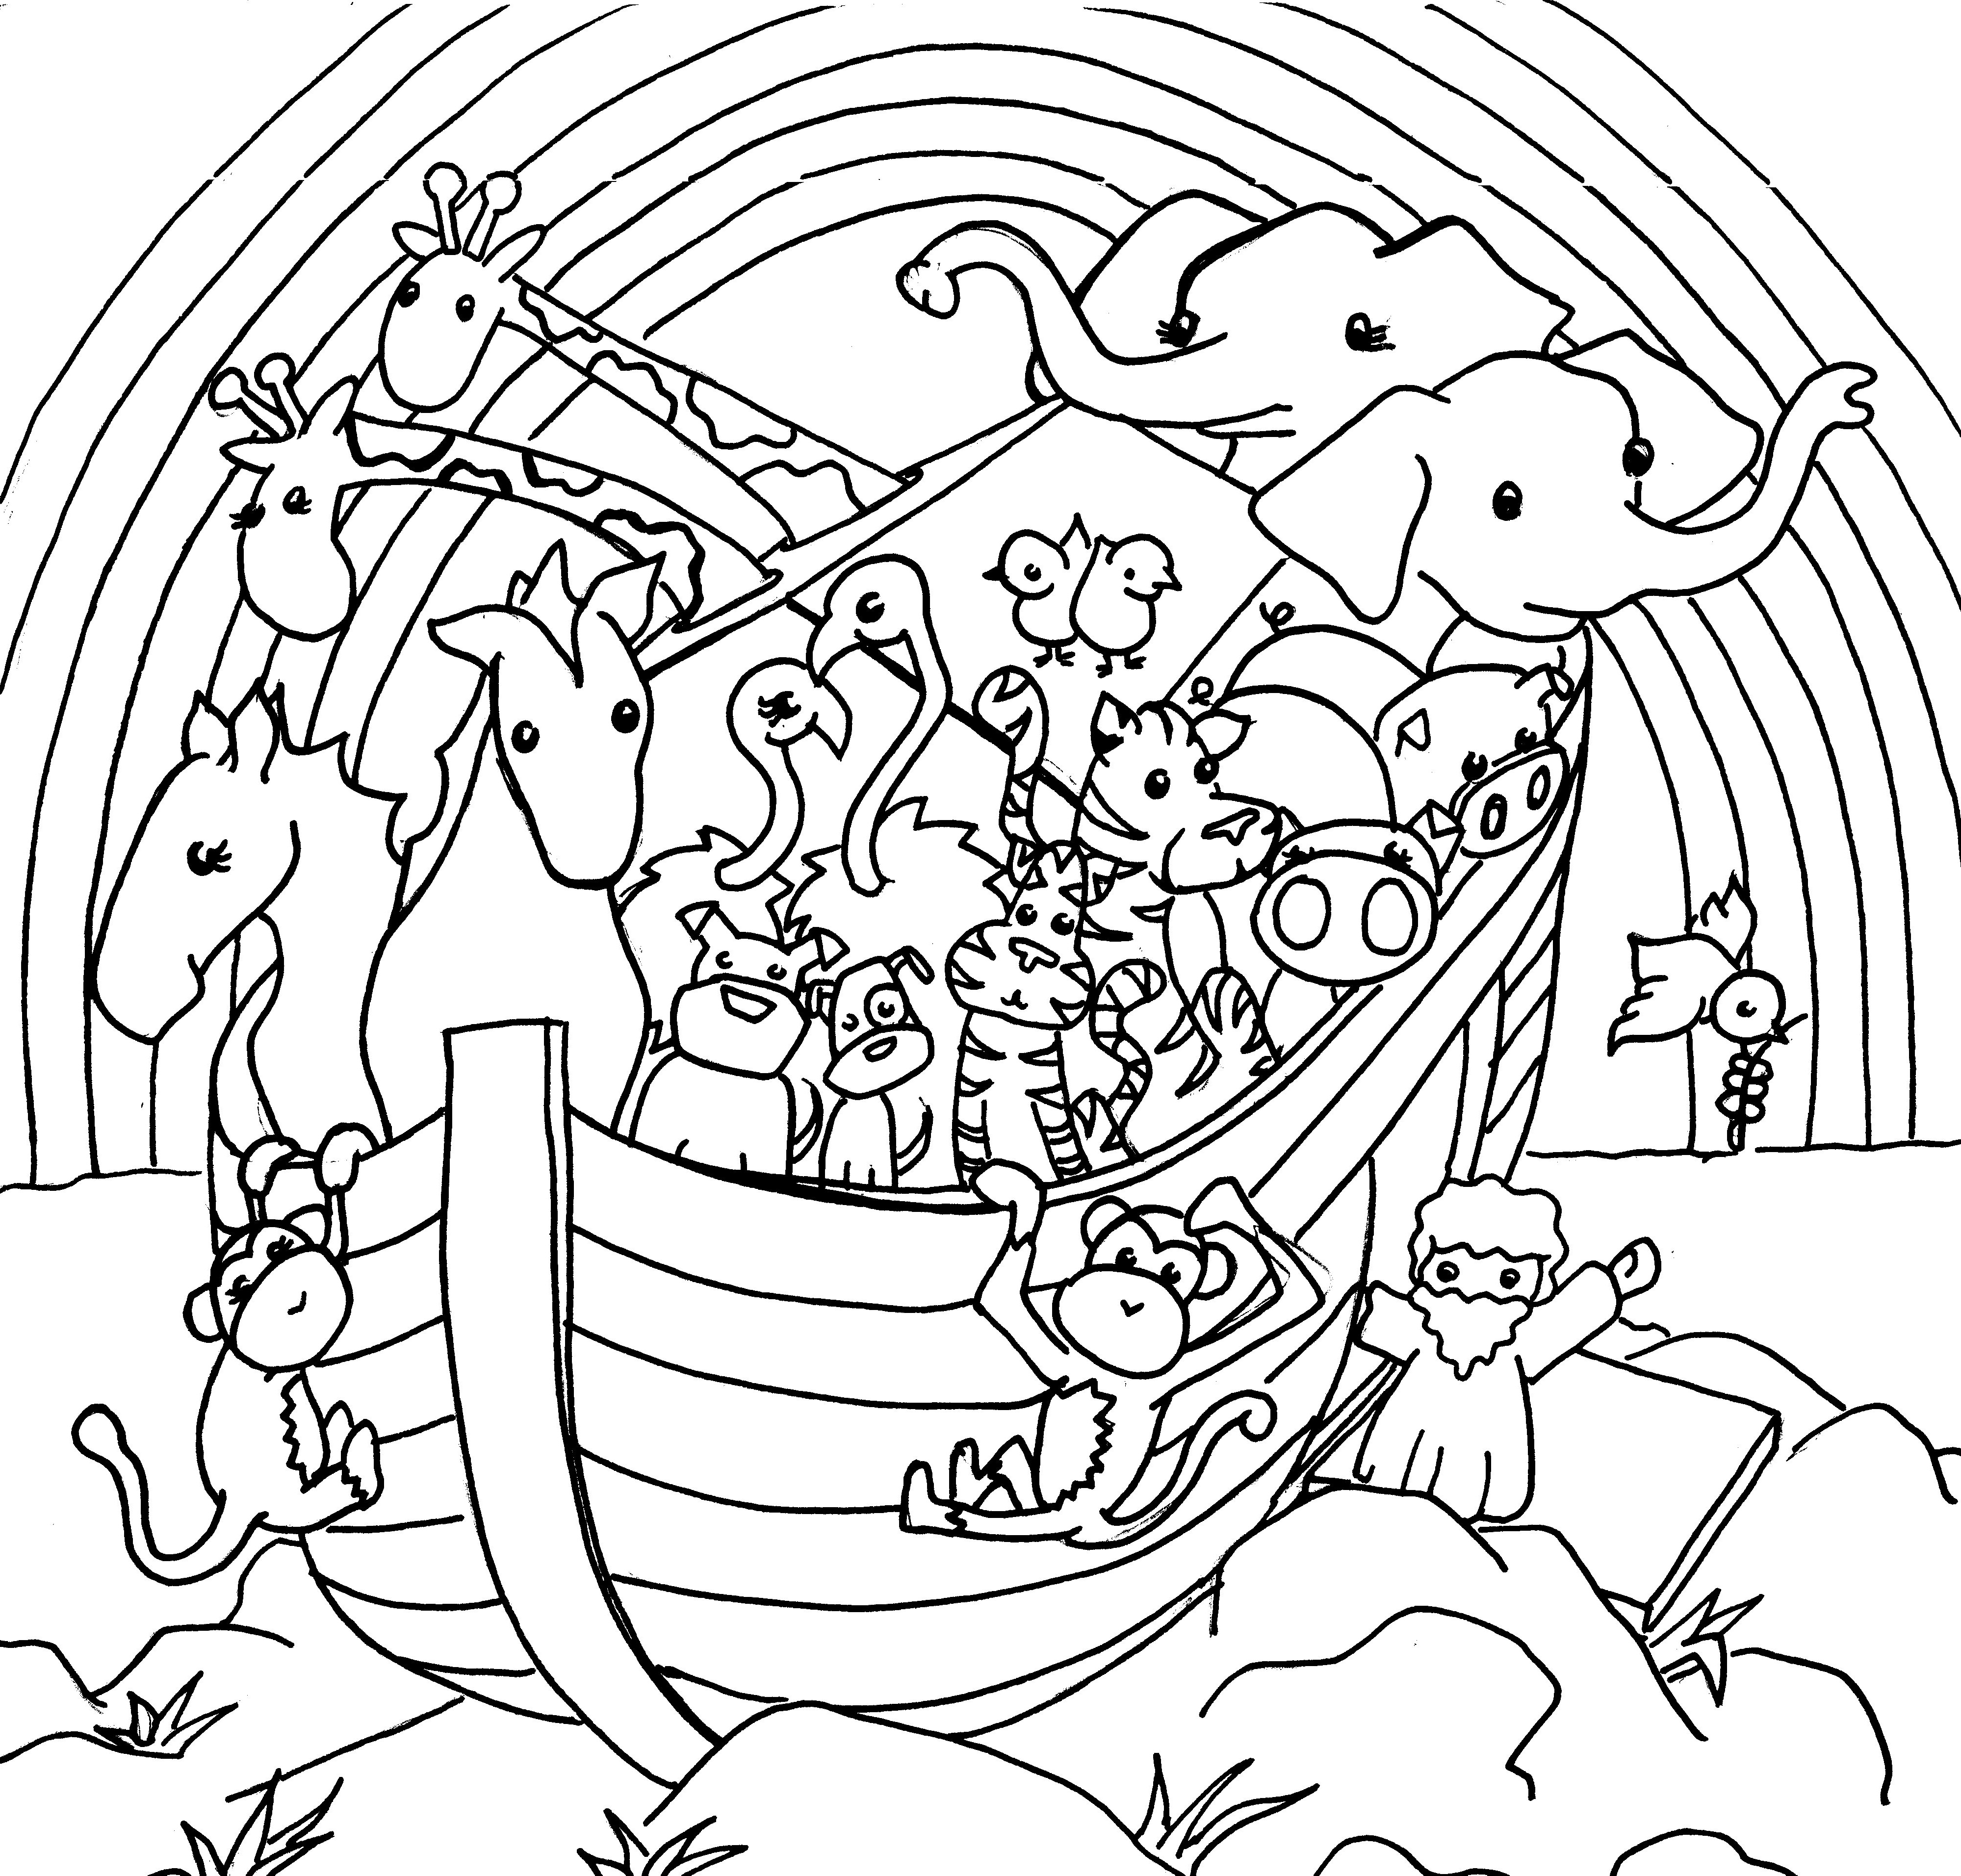 noahs ark by havilah gray at coroflot com